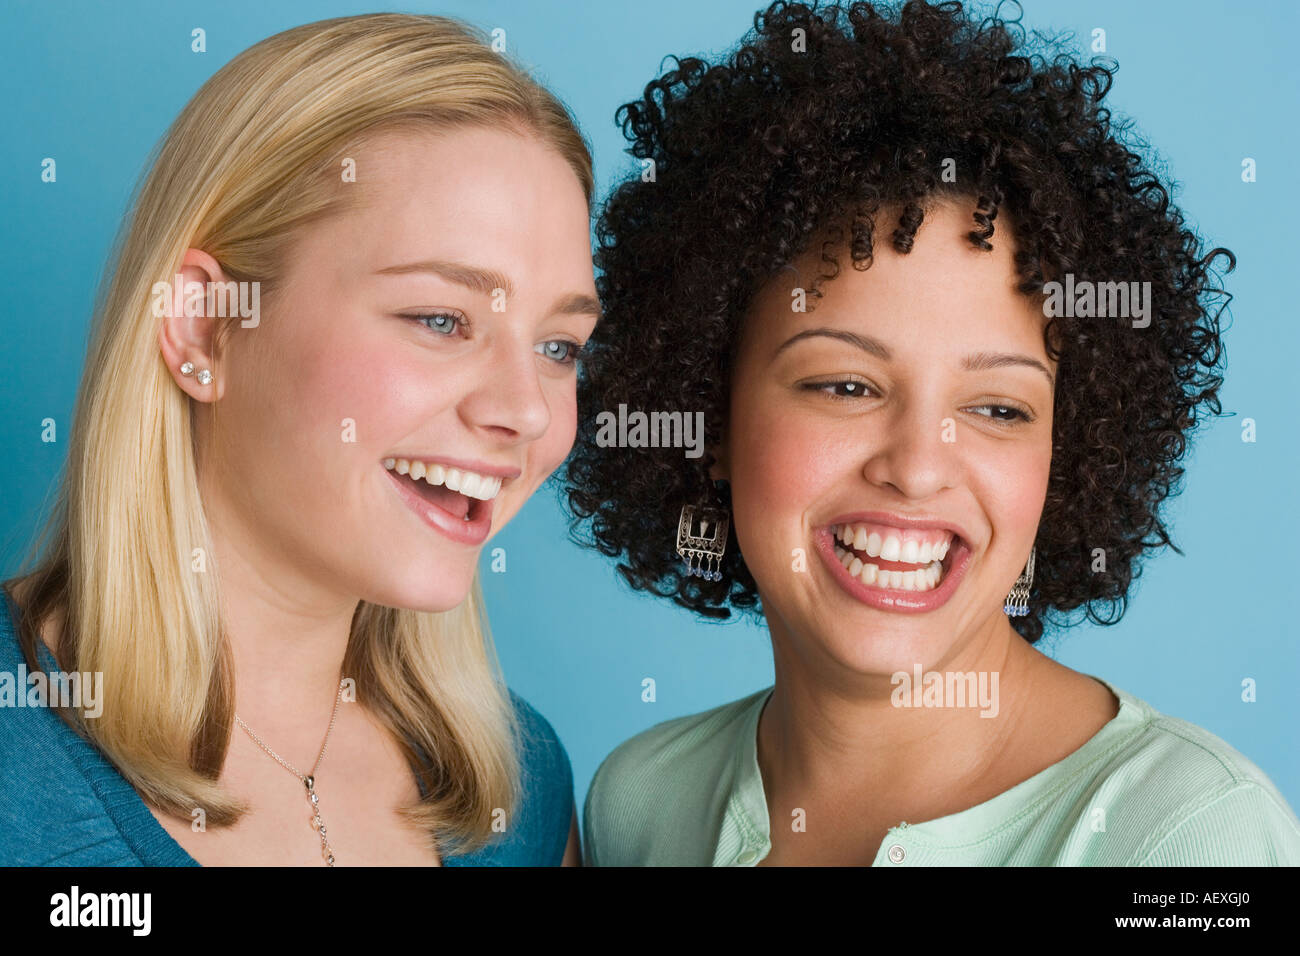 Closeup of two smiling women - Stock Image